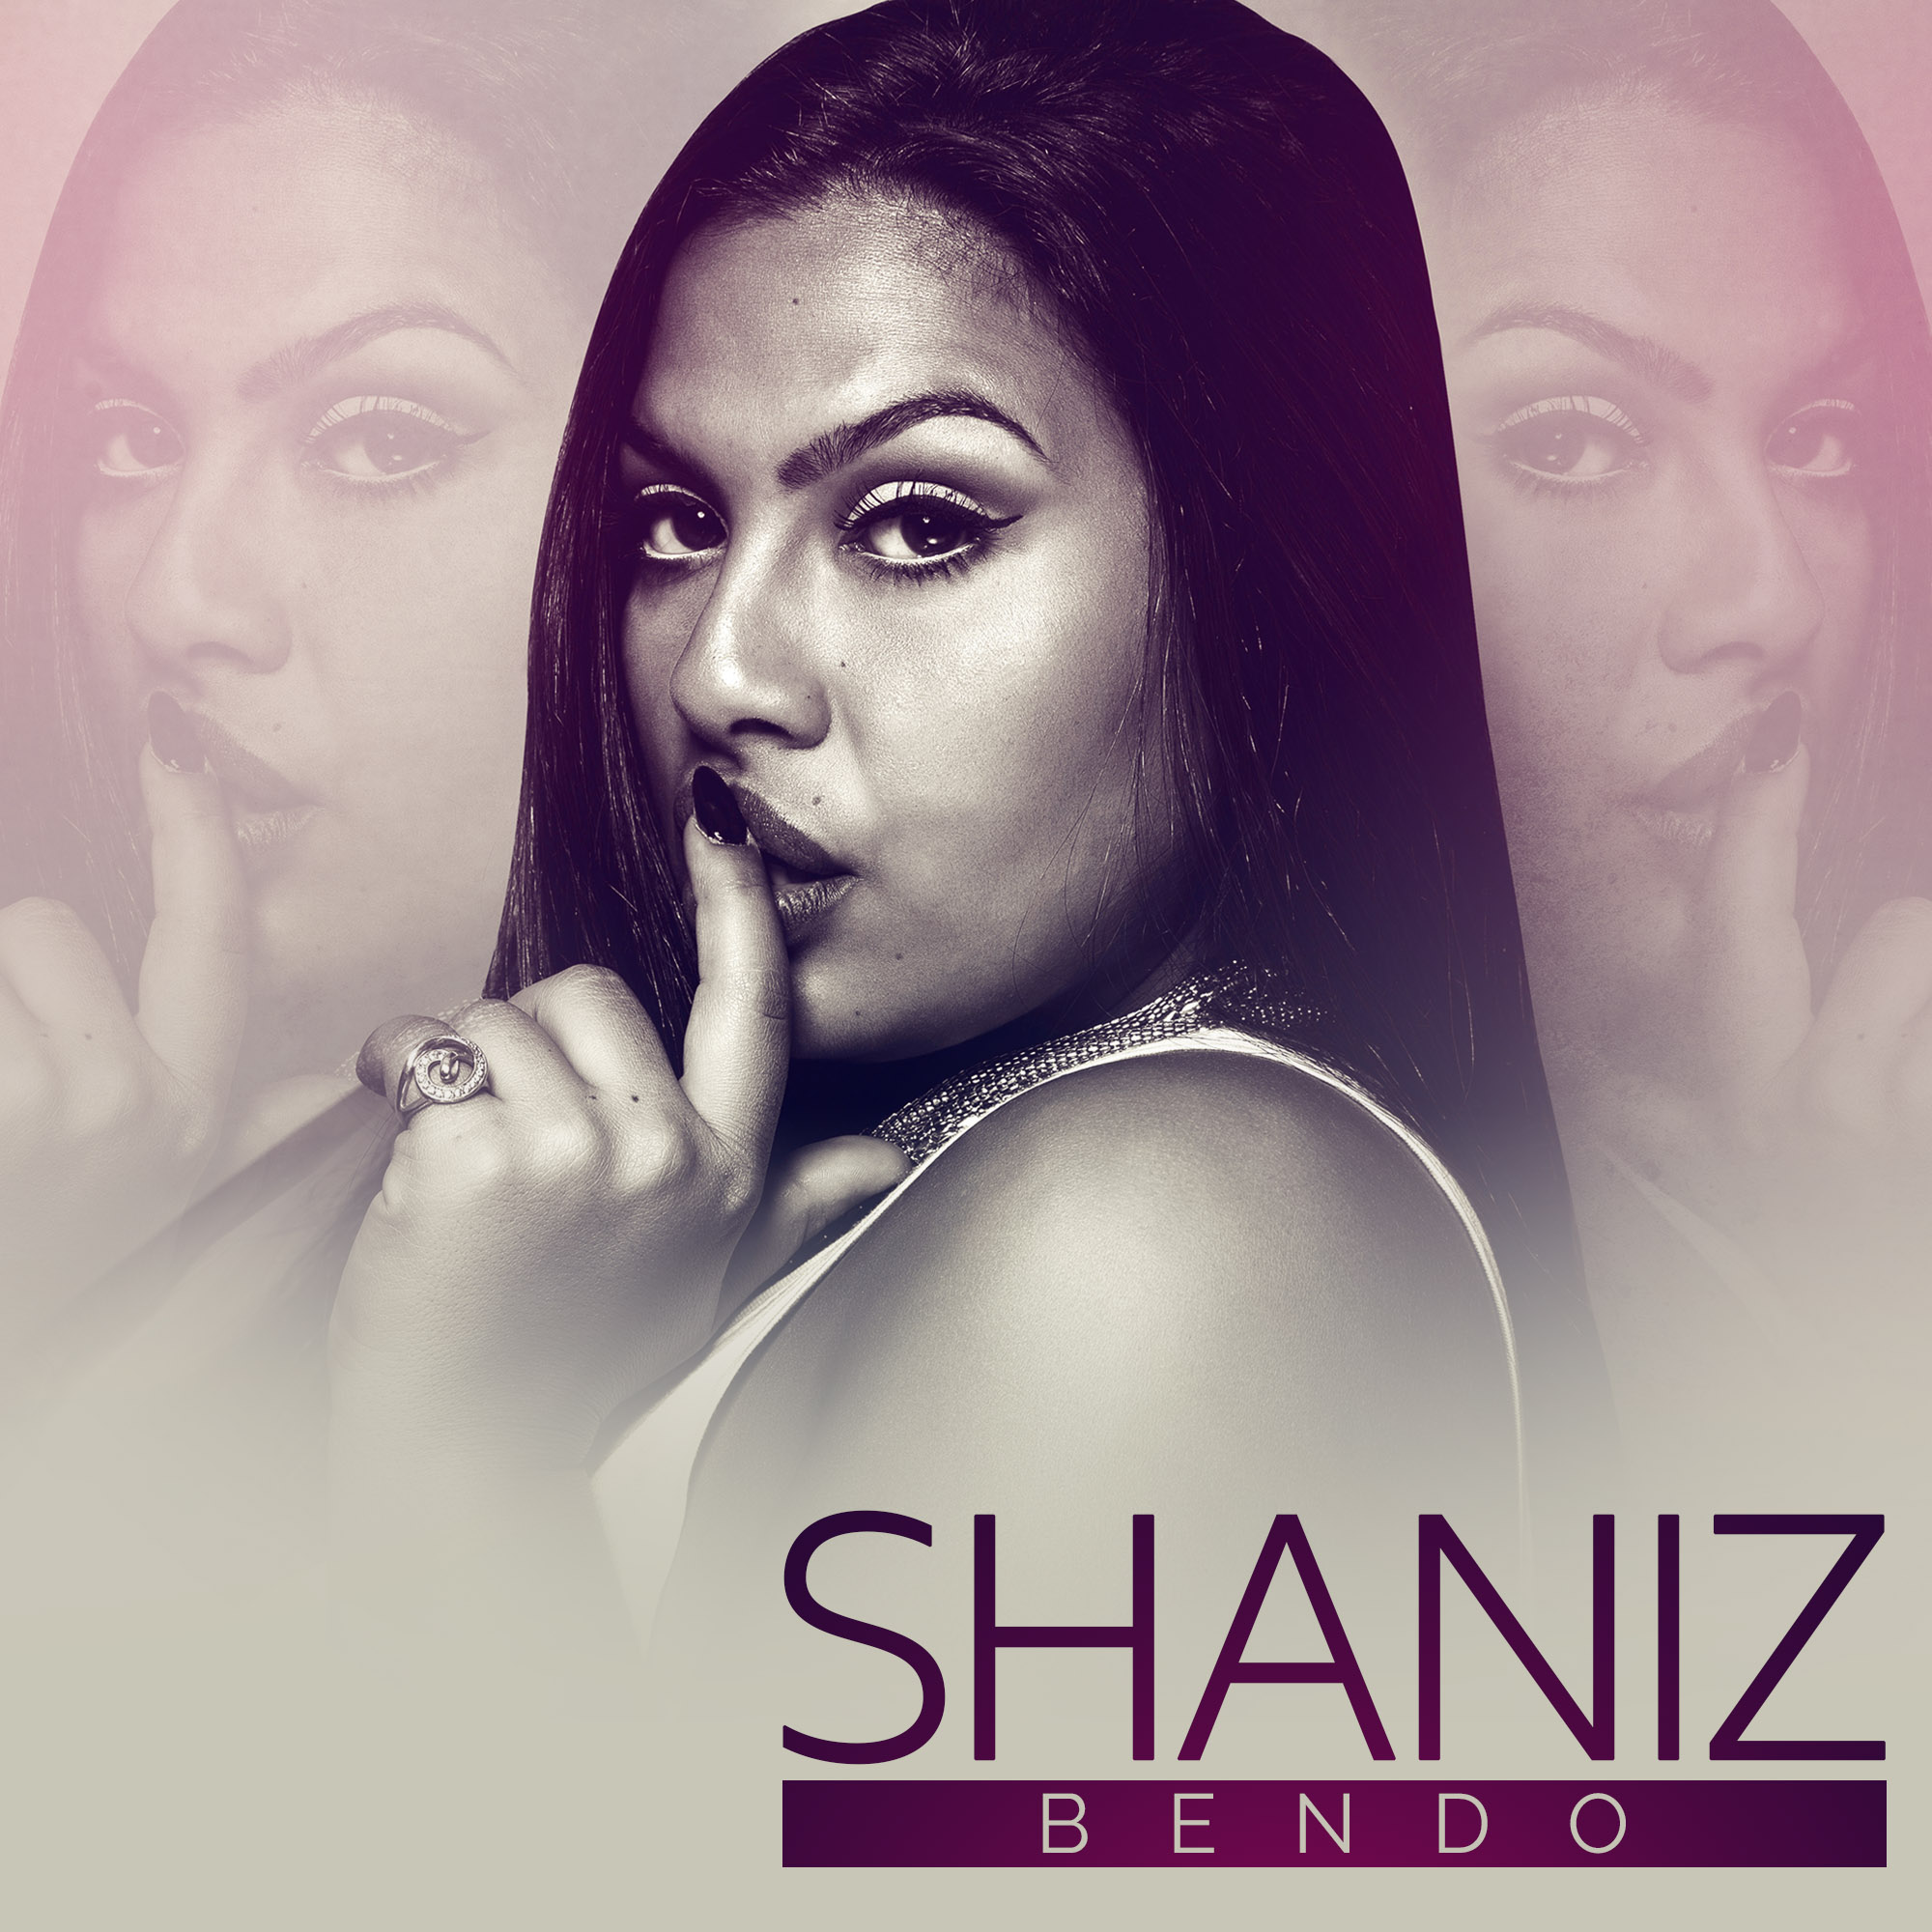 Shaniz-Bendo-Cover JusrMusic.fr